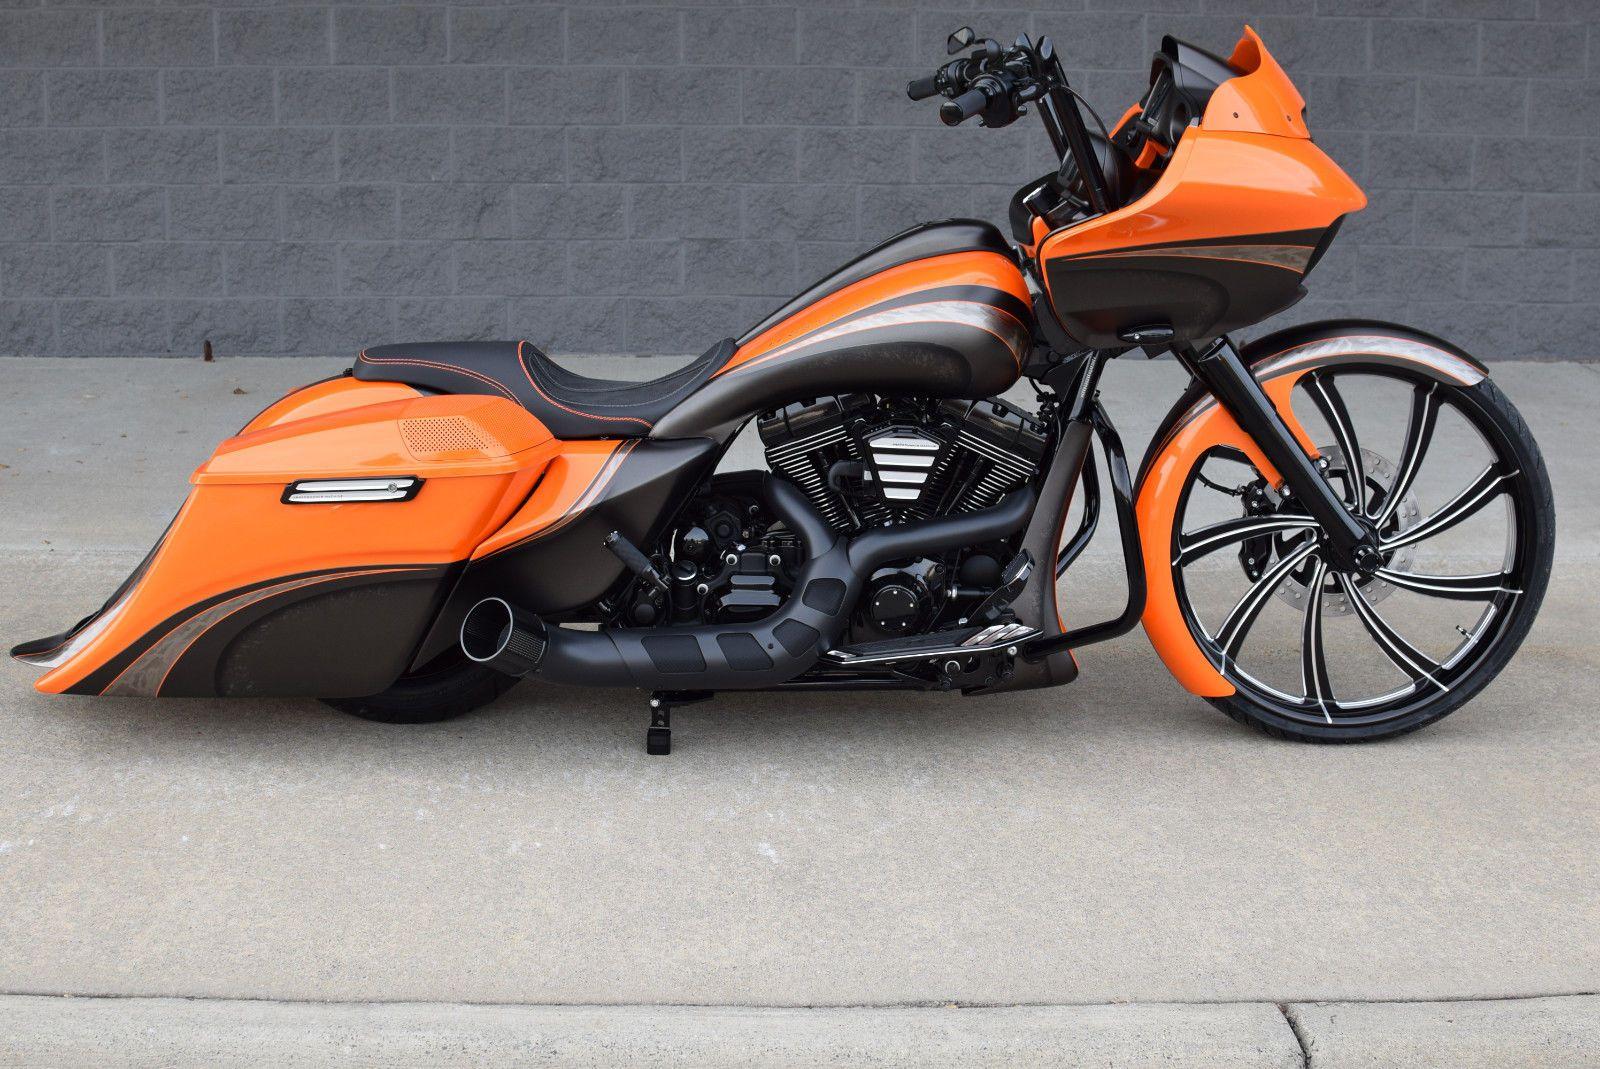 eBay: 2016 Harley-Davidson Touring 2016 ROAD GLIDE SPECIAL